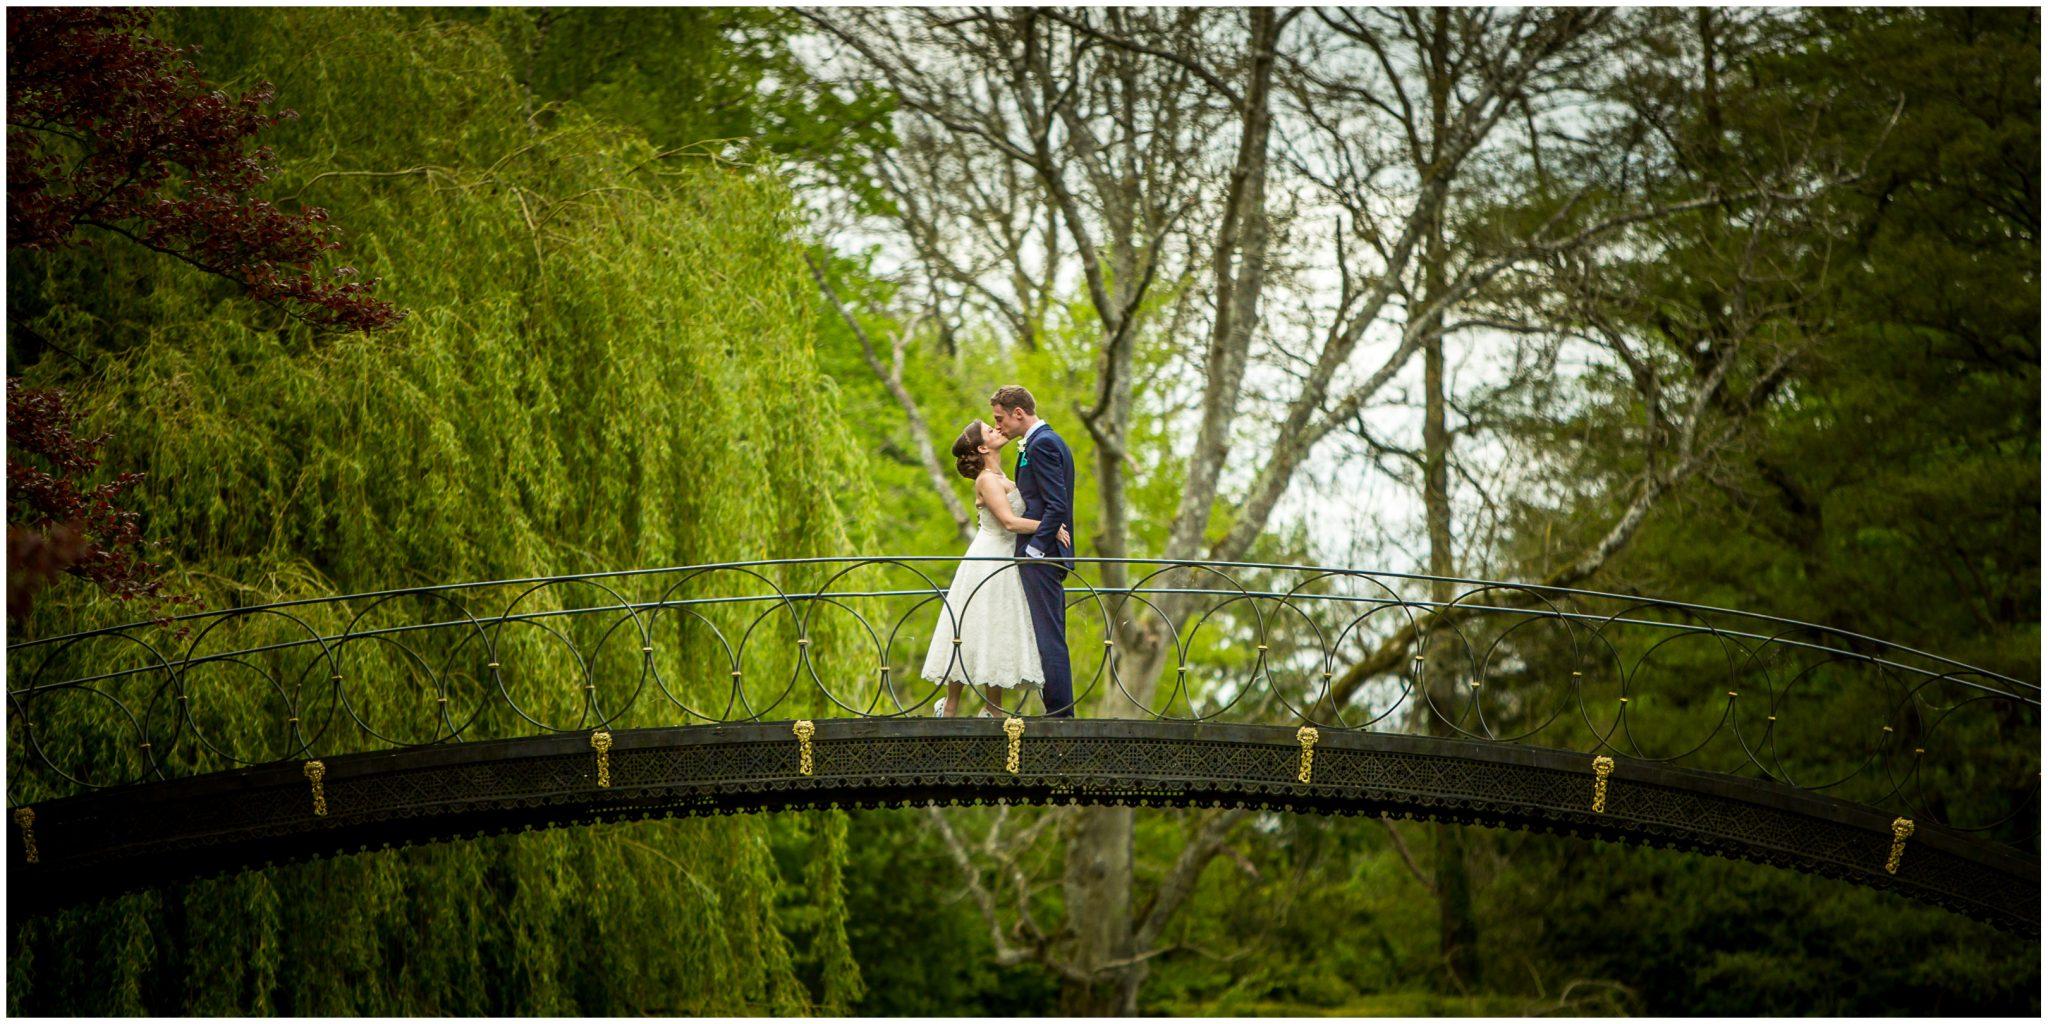 Avington Park wedding photography couple on iron bridge